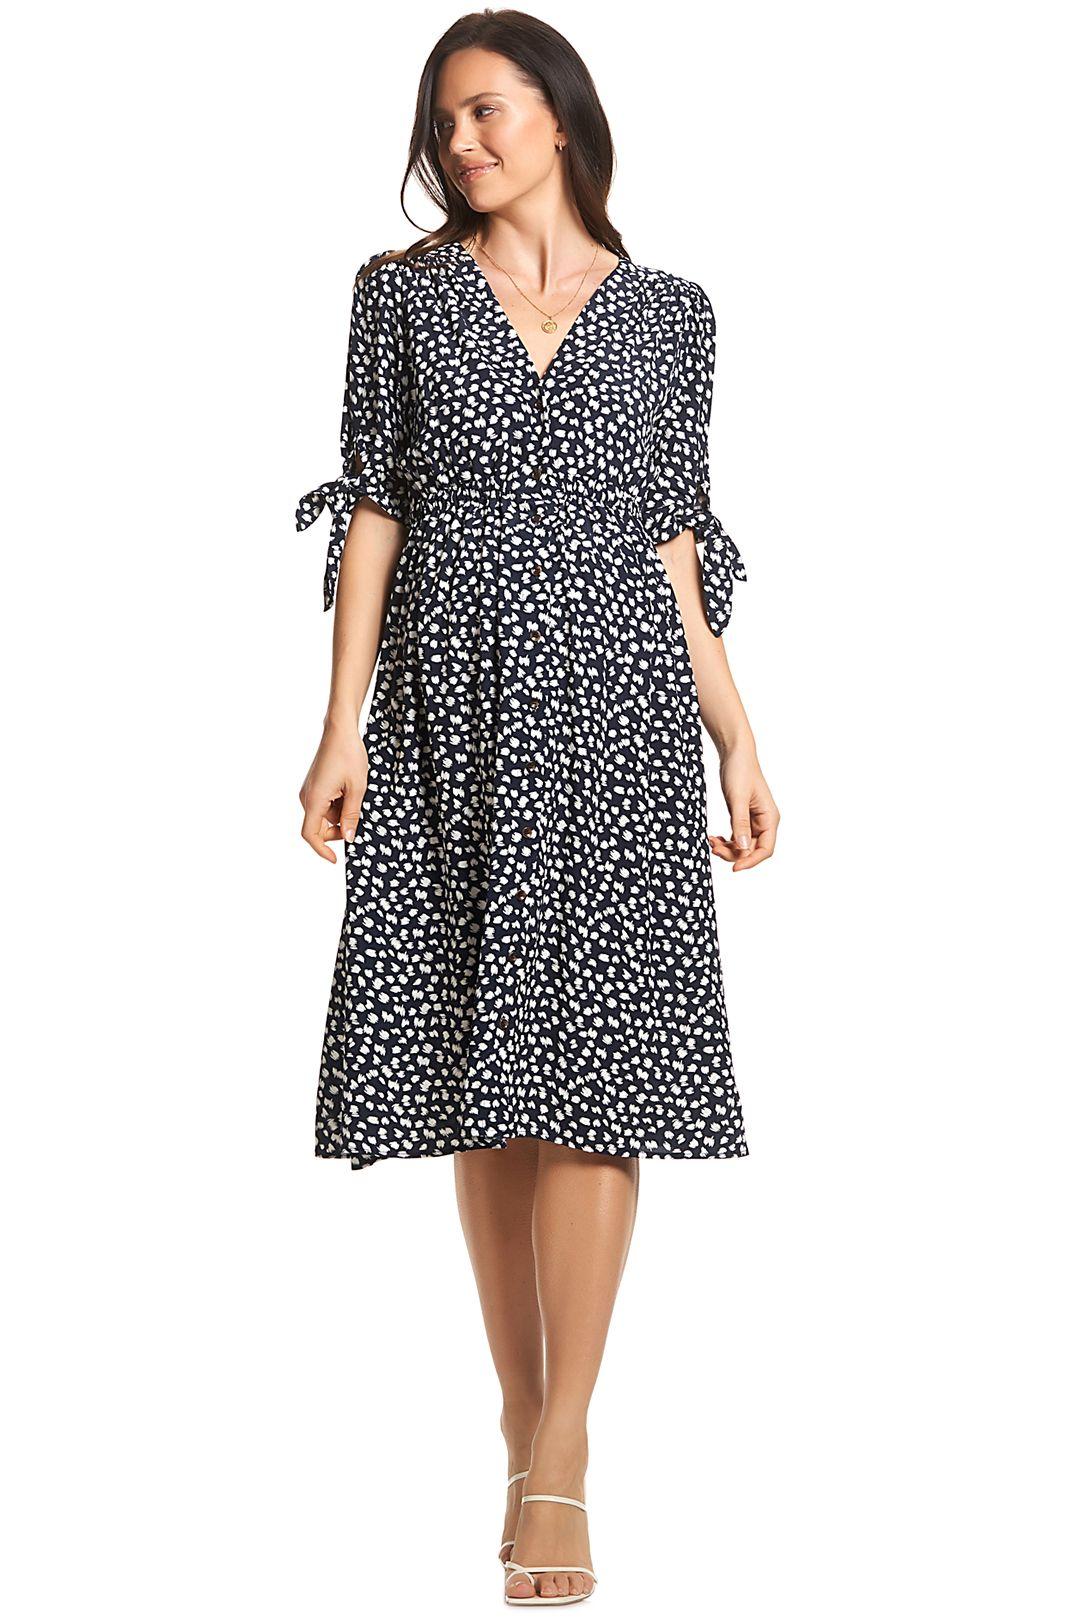 Soon-Maternity-Zippi-Dress-Navy-Speck-Front2